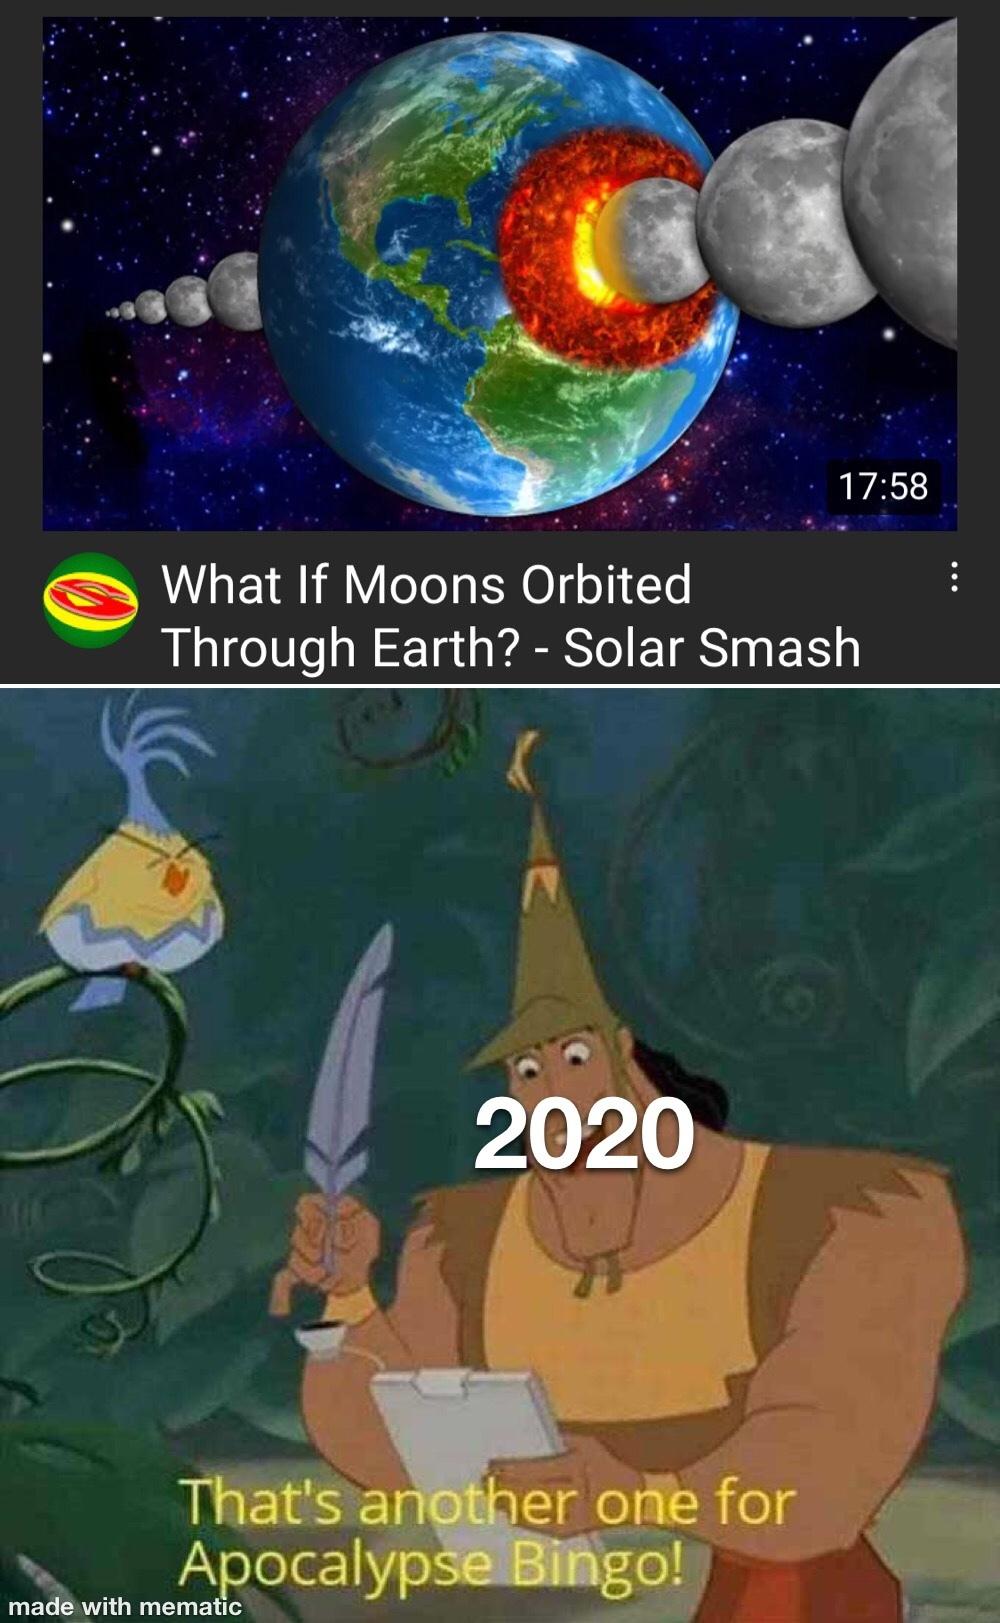 no stop it 2020 - meme